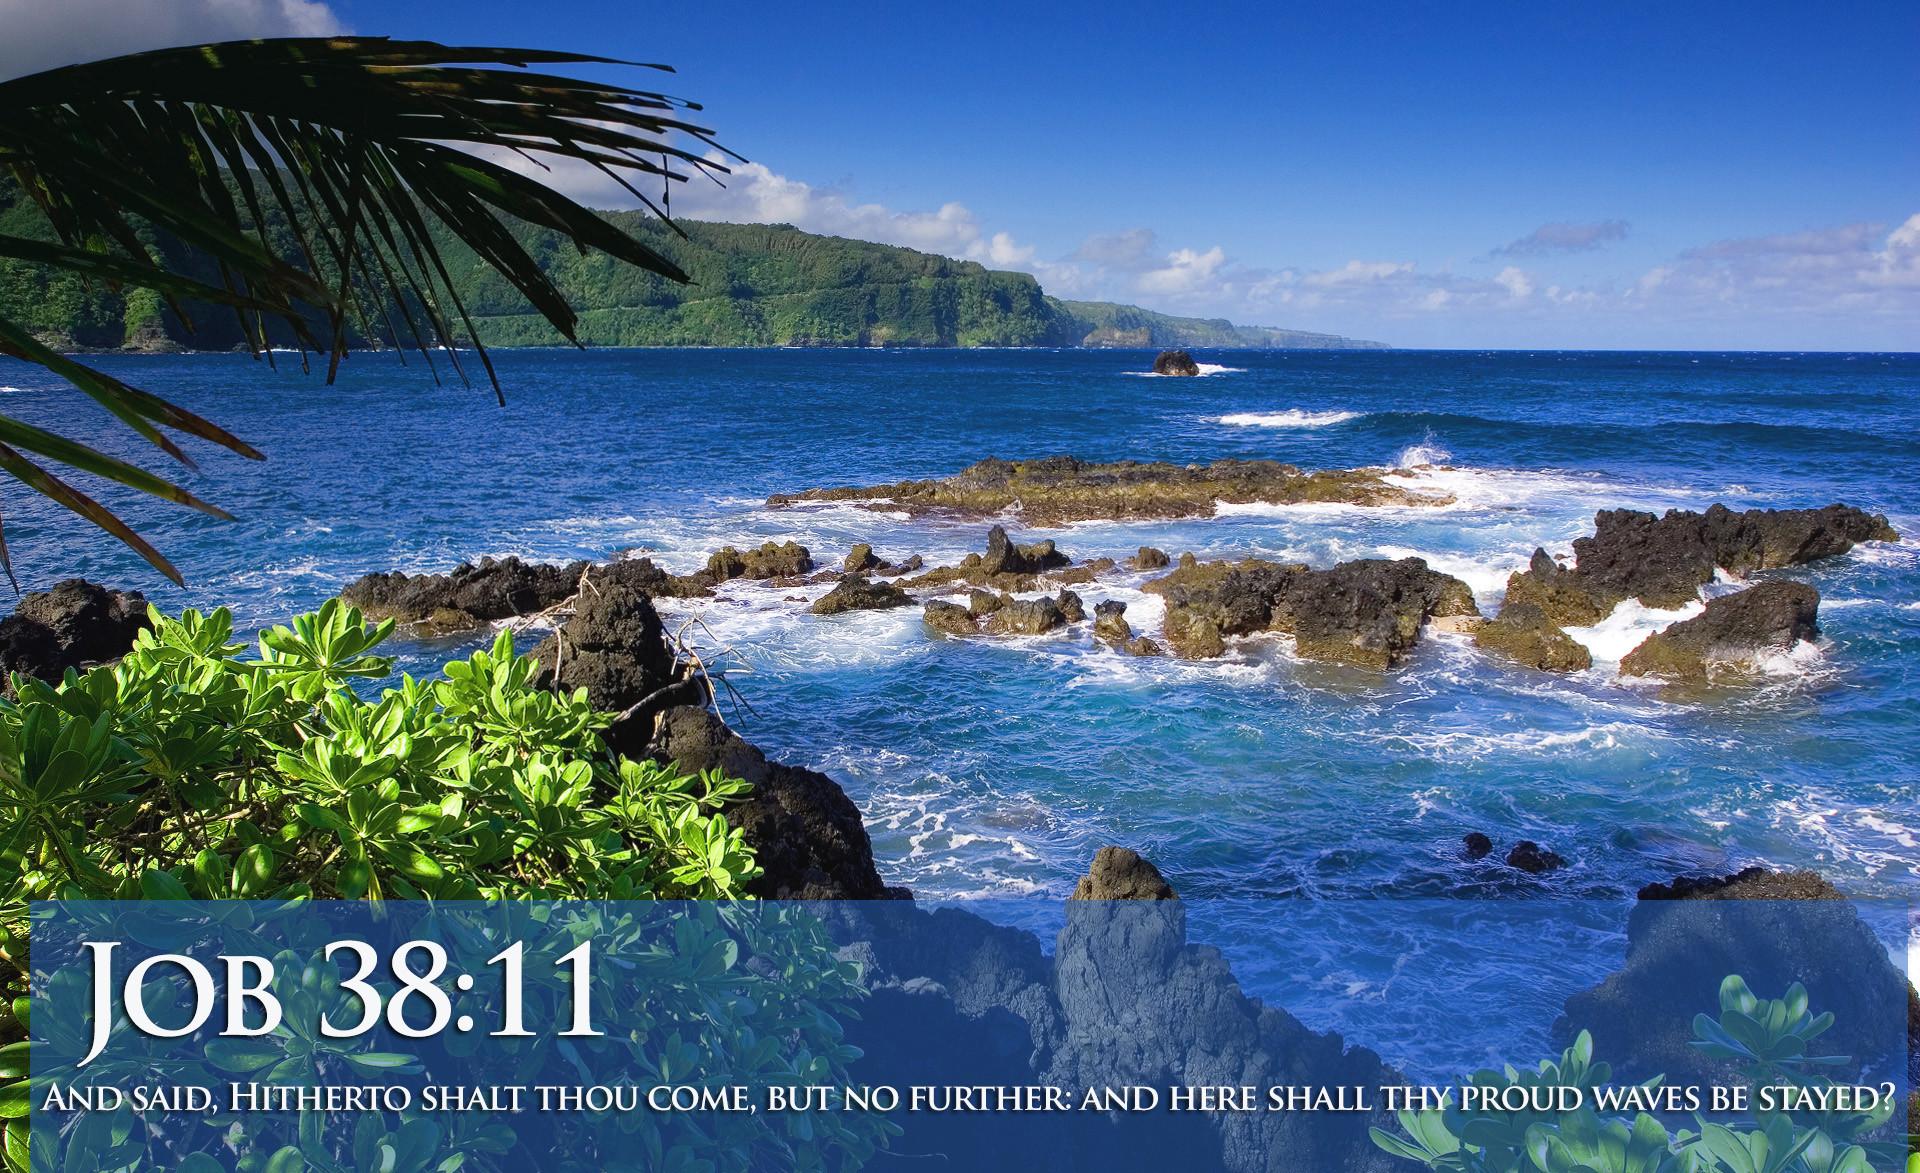 Job 38:11 Ocean View With Scripture HD Wallpaper